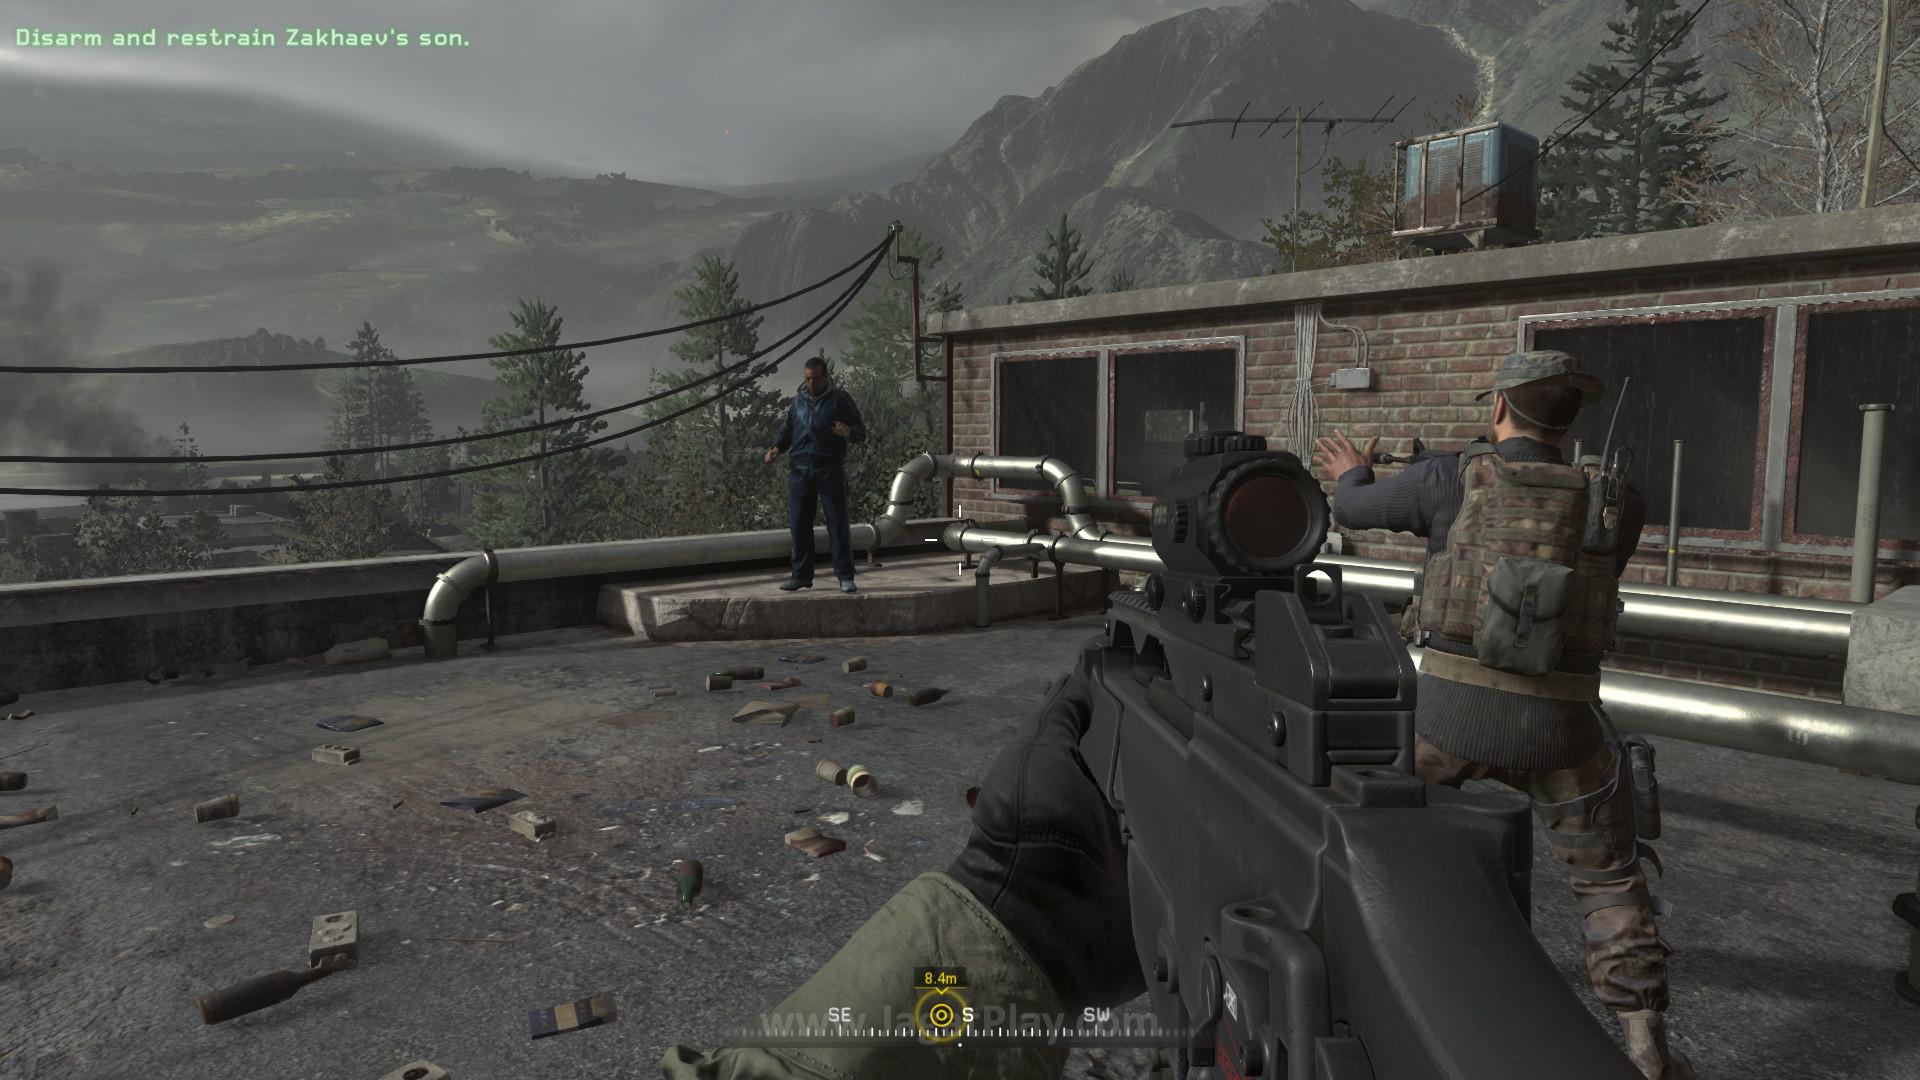 Billy Murray in Call of Duty: Modern Warfare Remastered (2016)